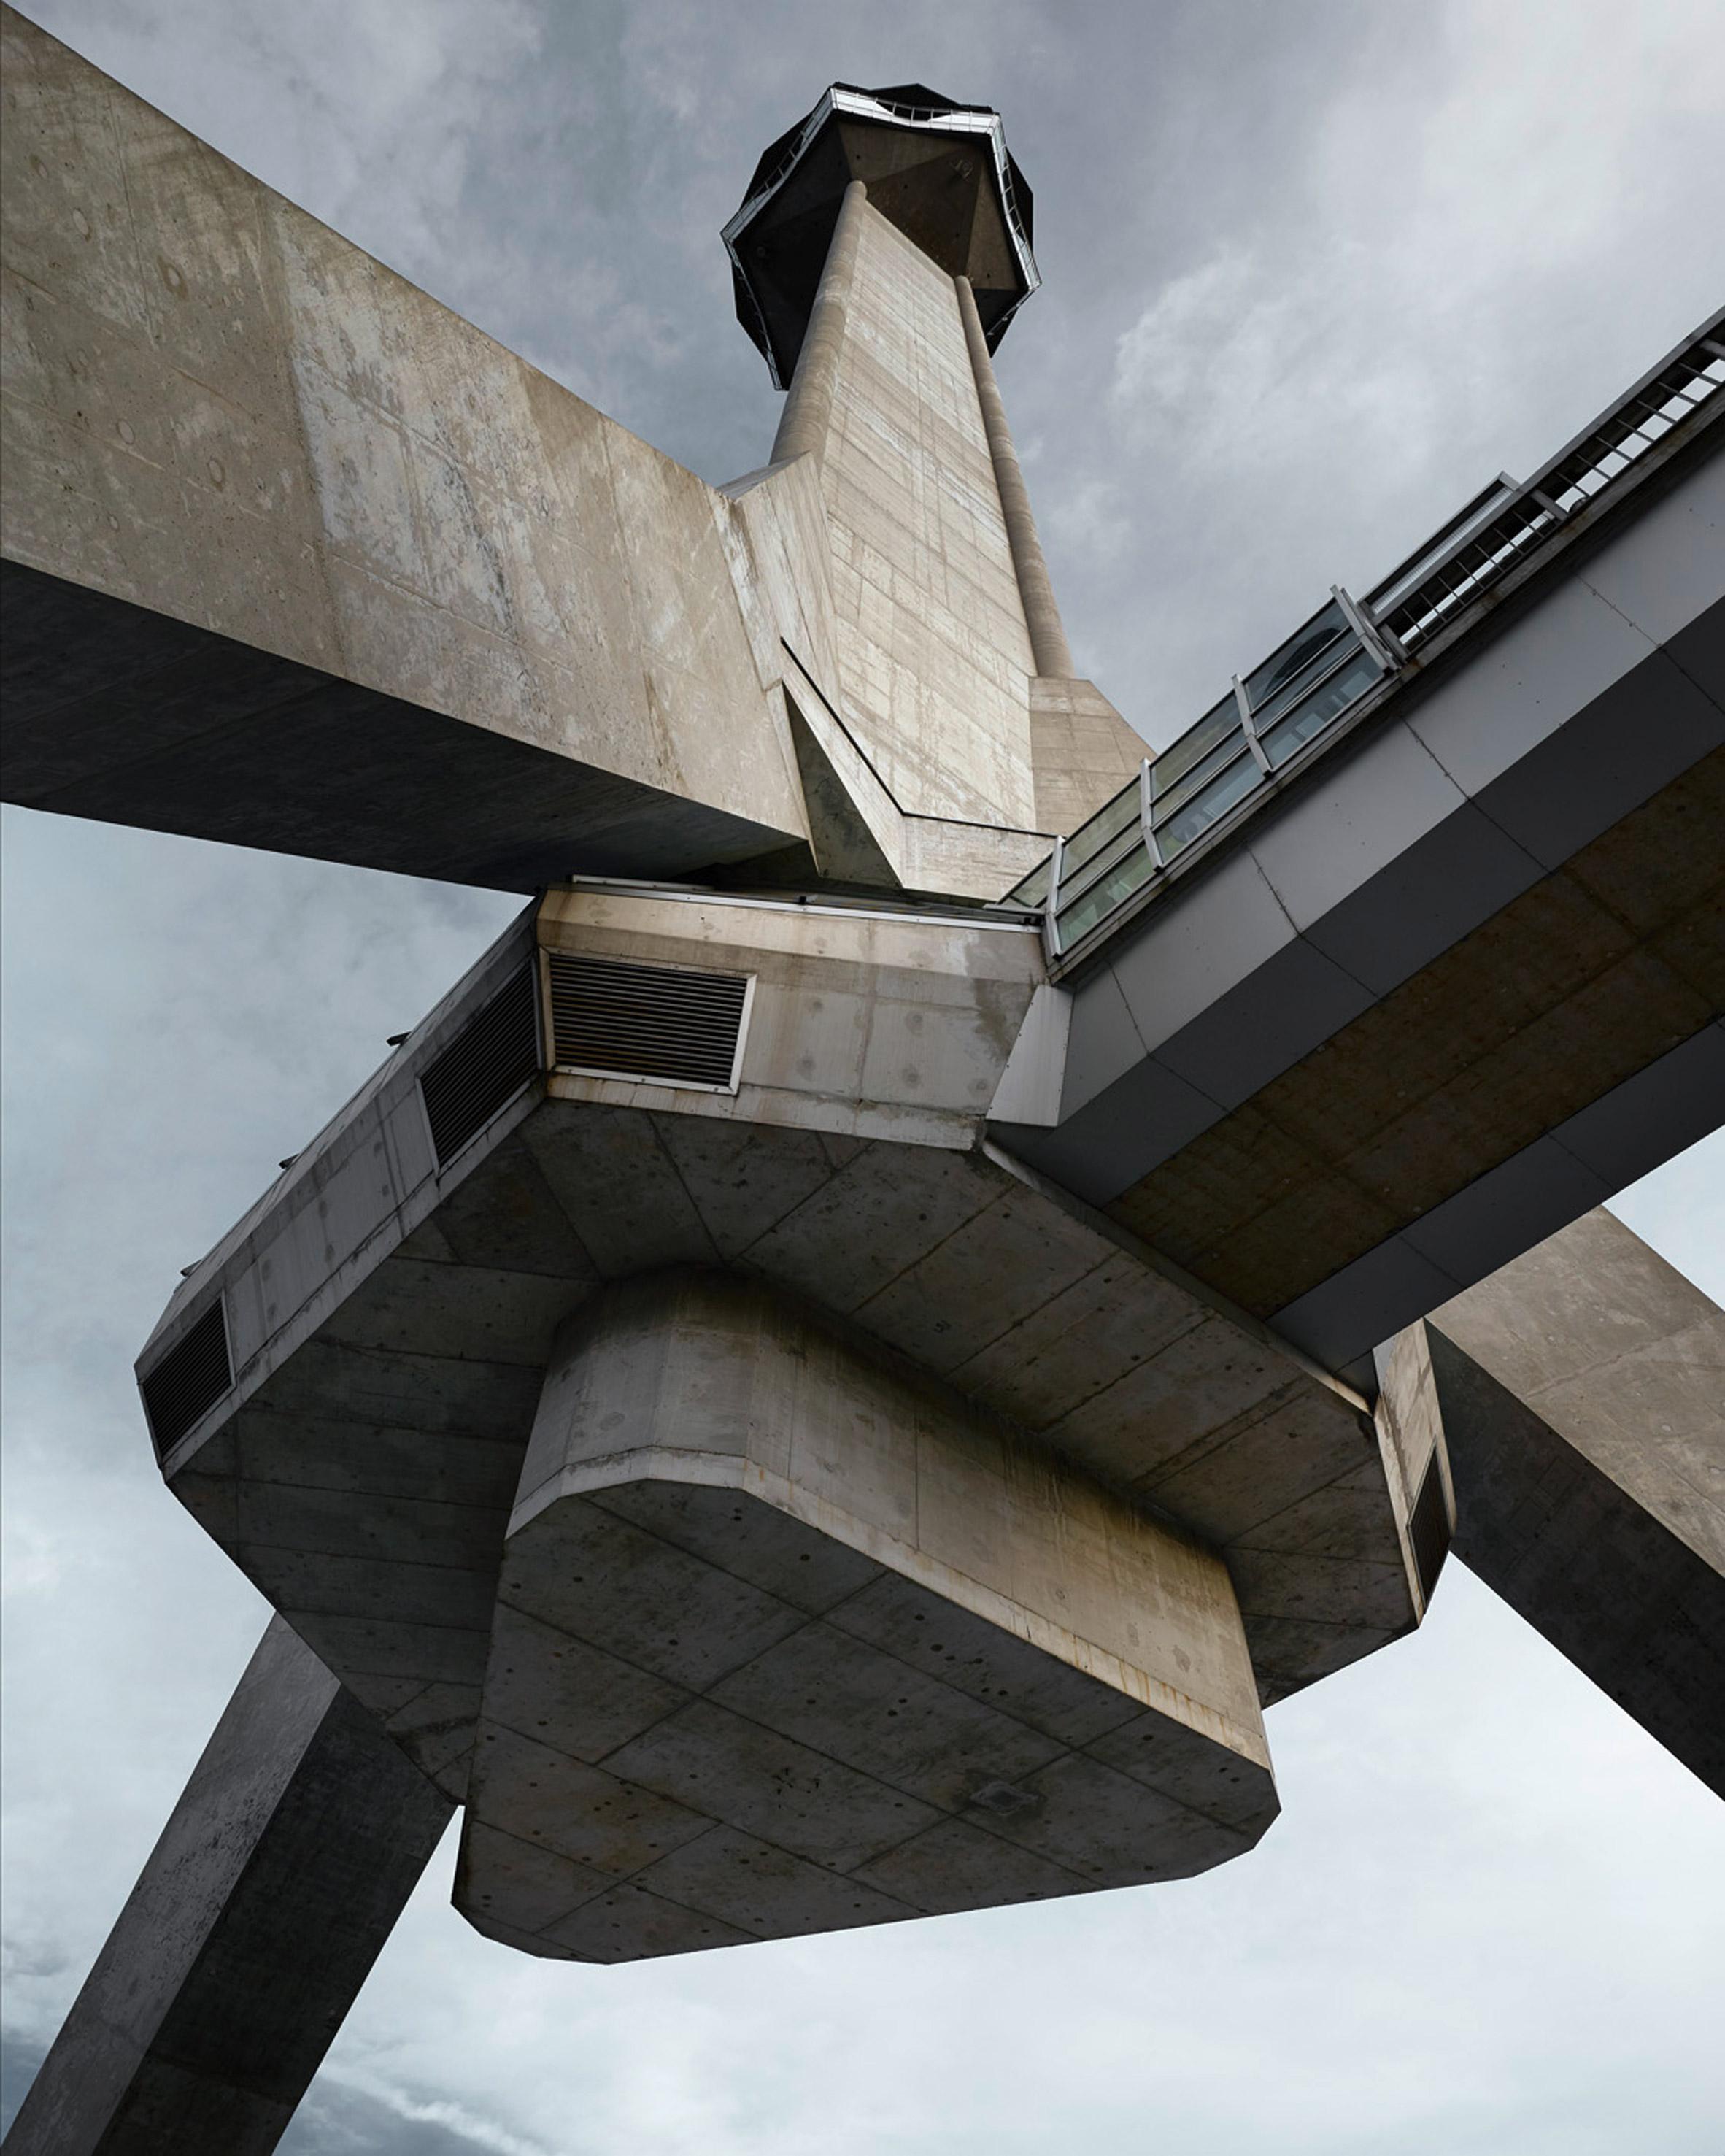 valentin-jeck-photographs-moma-toward-a-concrete-utopia-architecture-yugoslavia_dezeen_2364_col_2.jpg